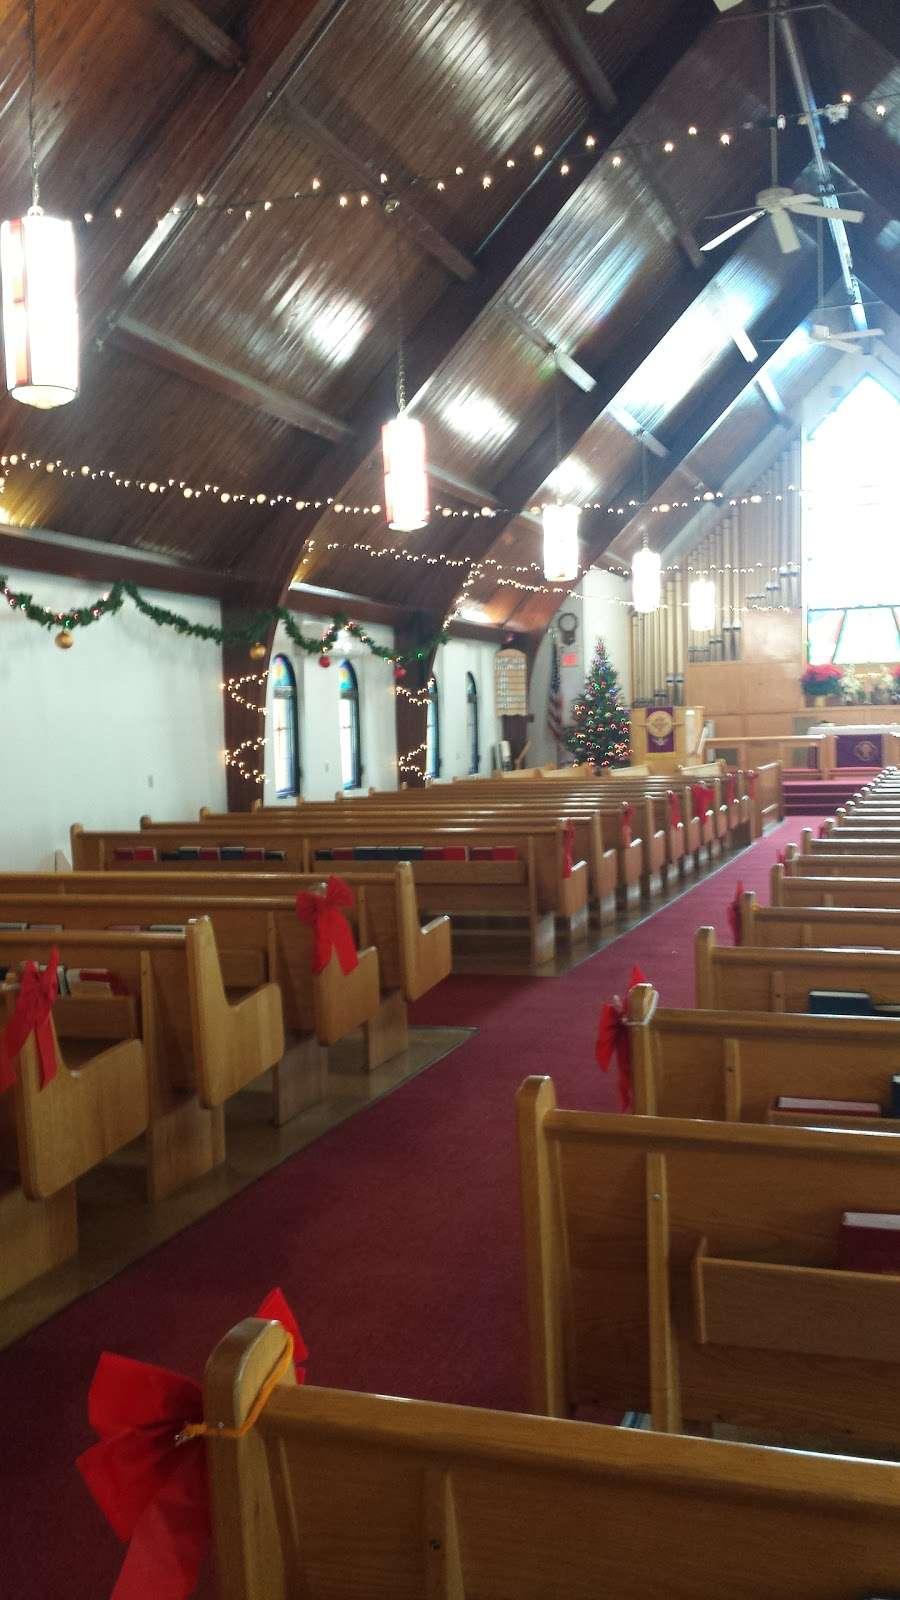 Church of South India Malayalam Congregation of Greater New York - church  | Photo 1 of 4 | Address: 3833 Jerusalem Ave, Seaford, NY 11783, USA | Phone: (516) 342-9879